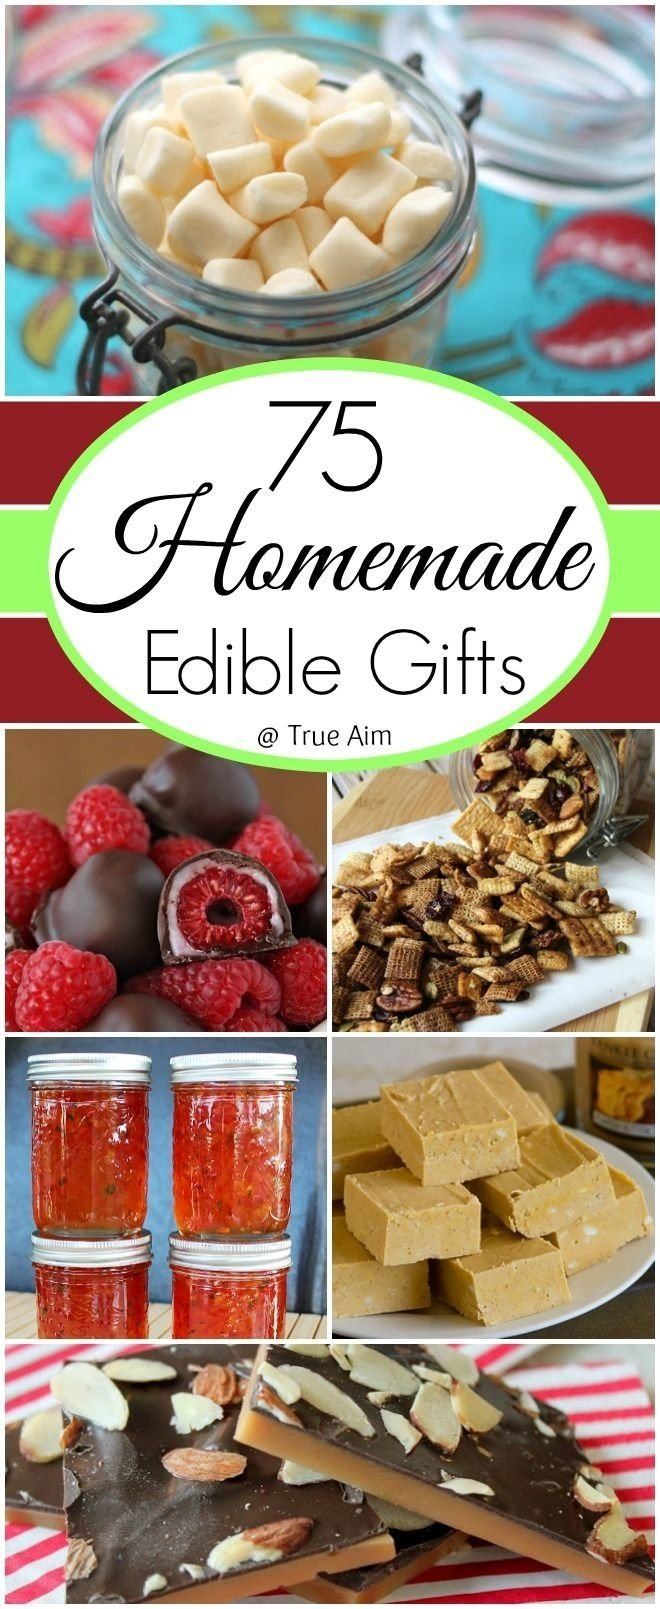 10 Famous Homemade Edible Christmas Gift Ideas 75 ideas for homemade edible gifts gifts in jars homemade truffles 2021